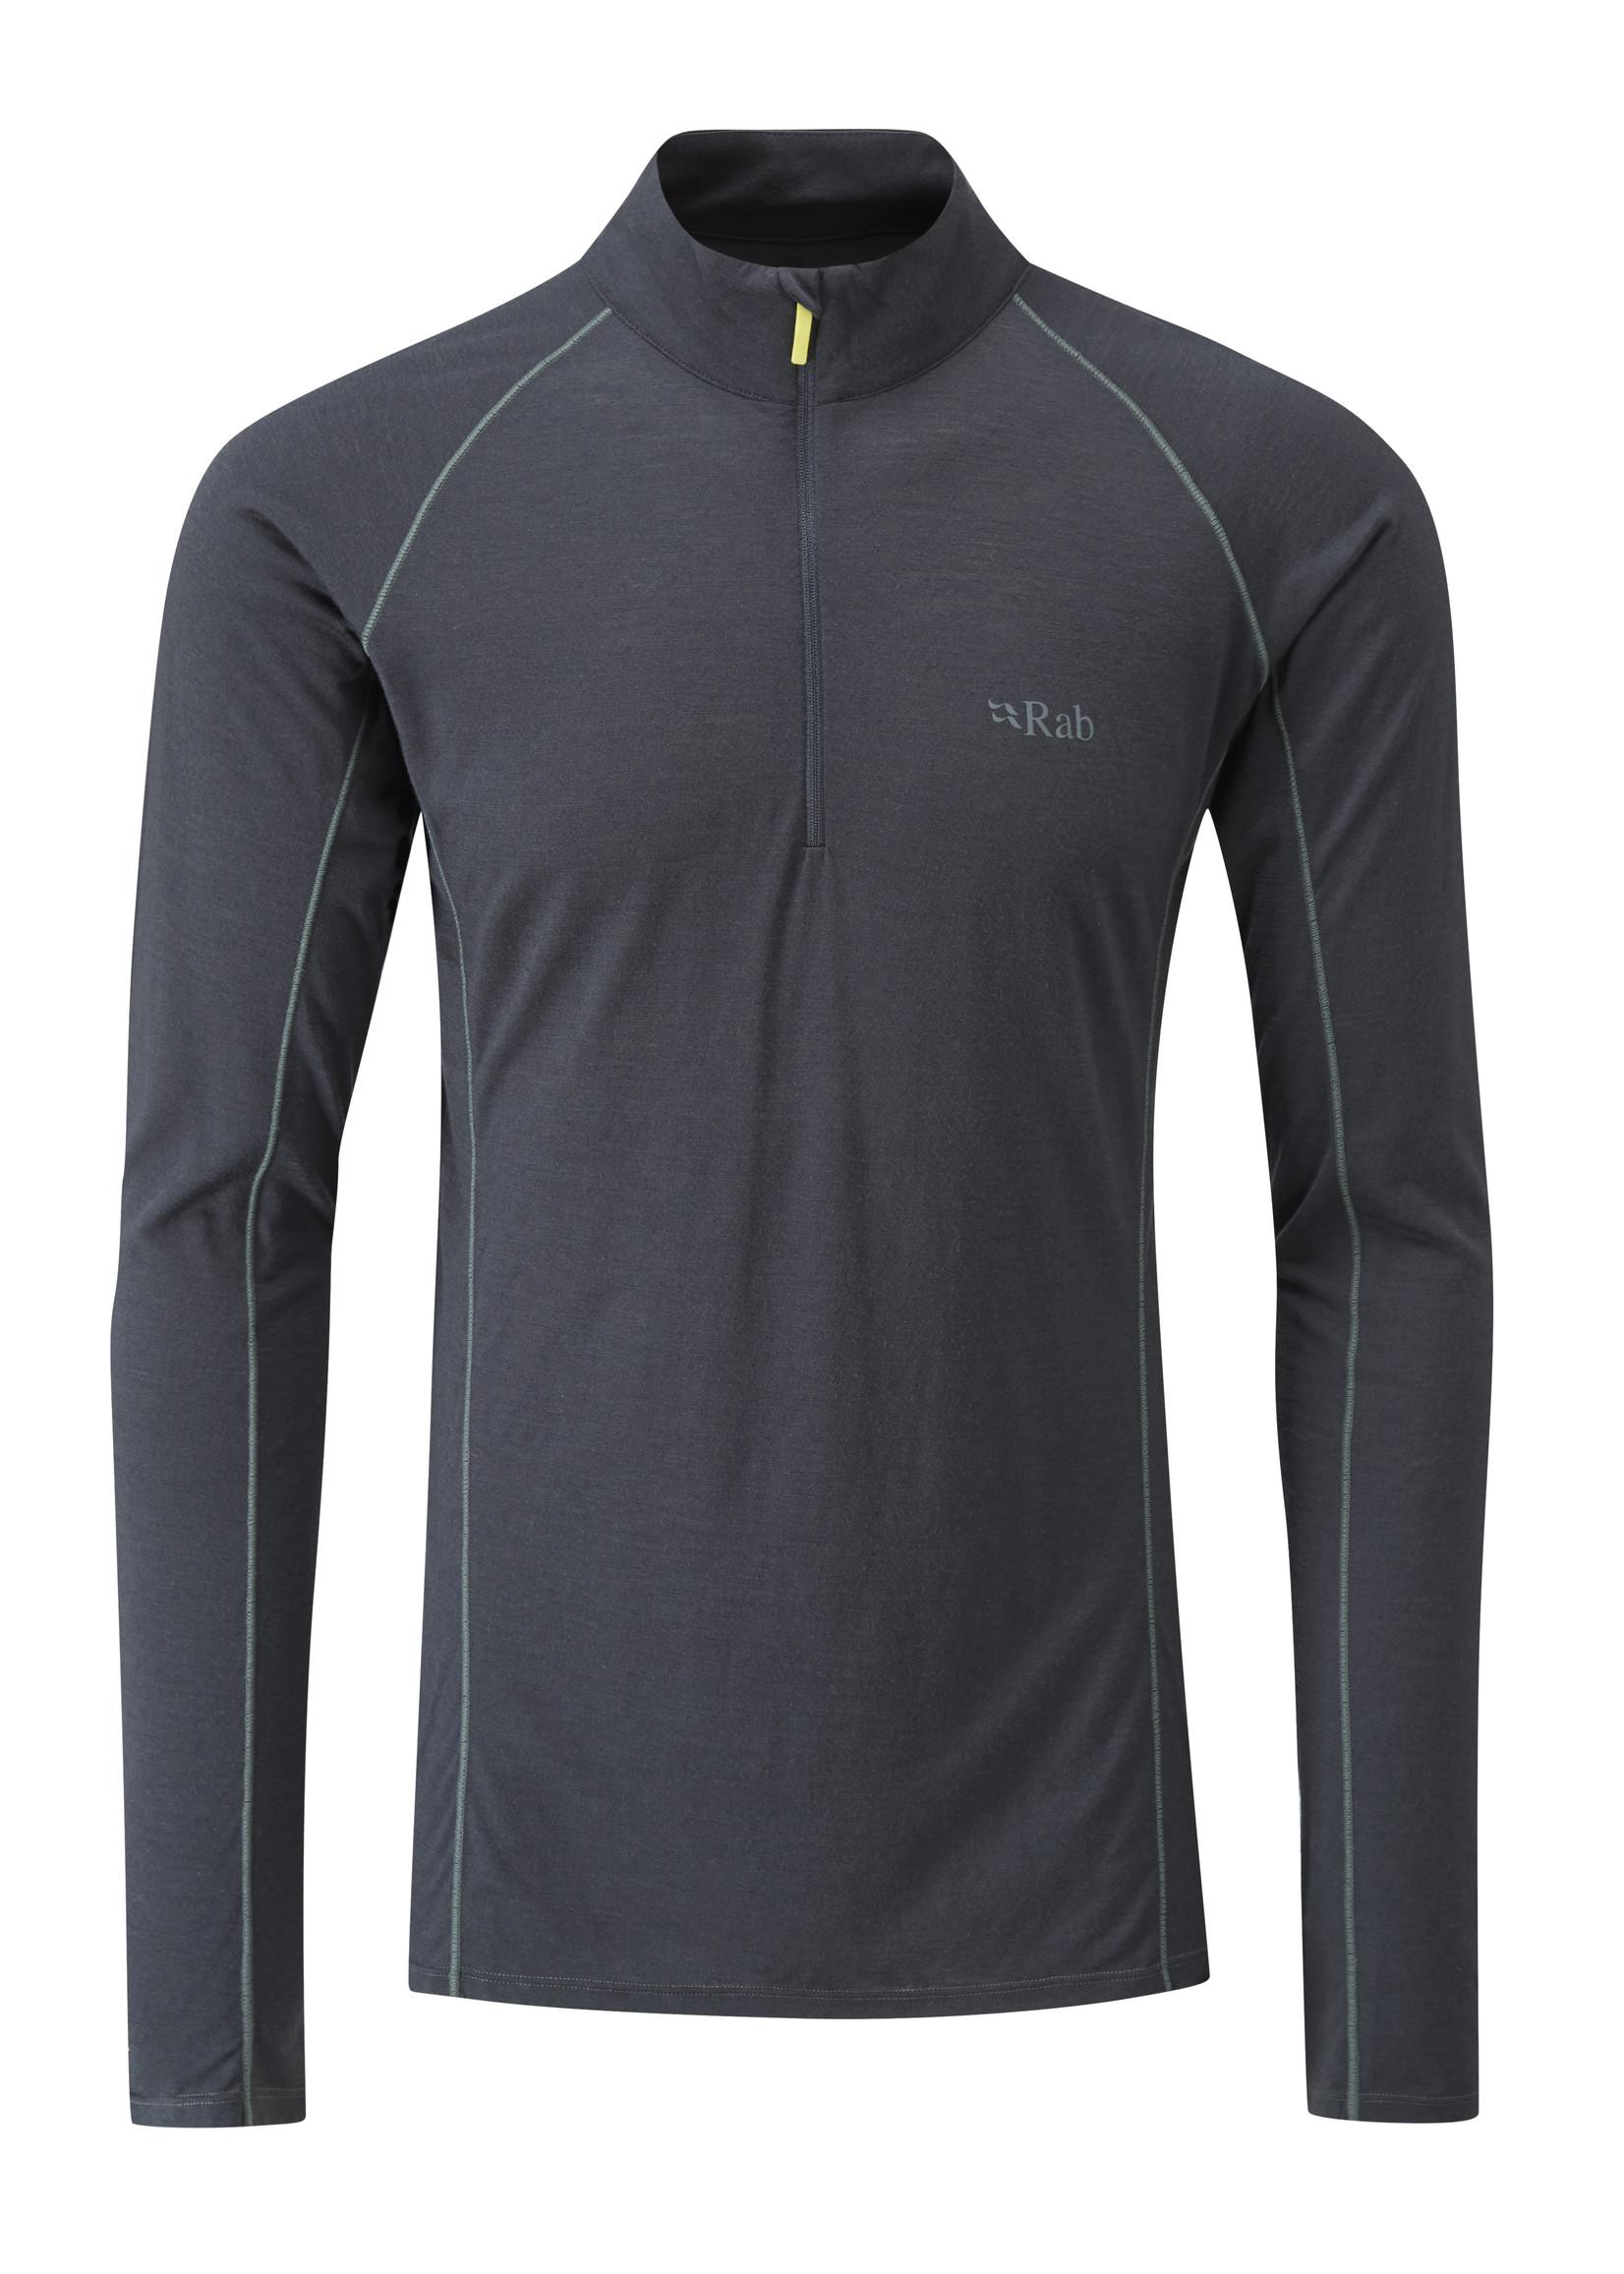 Rab Merino 120 + Long Sleeve Zip